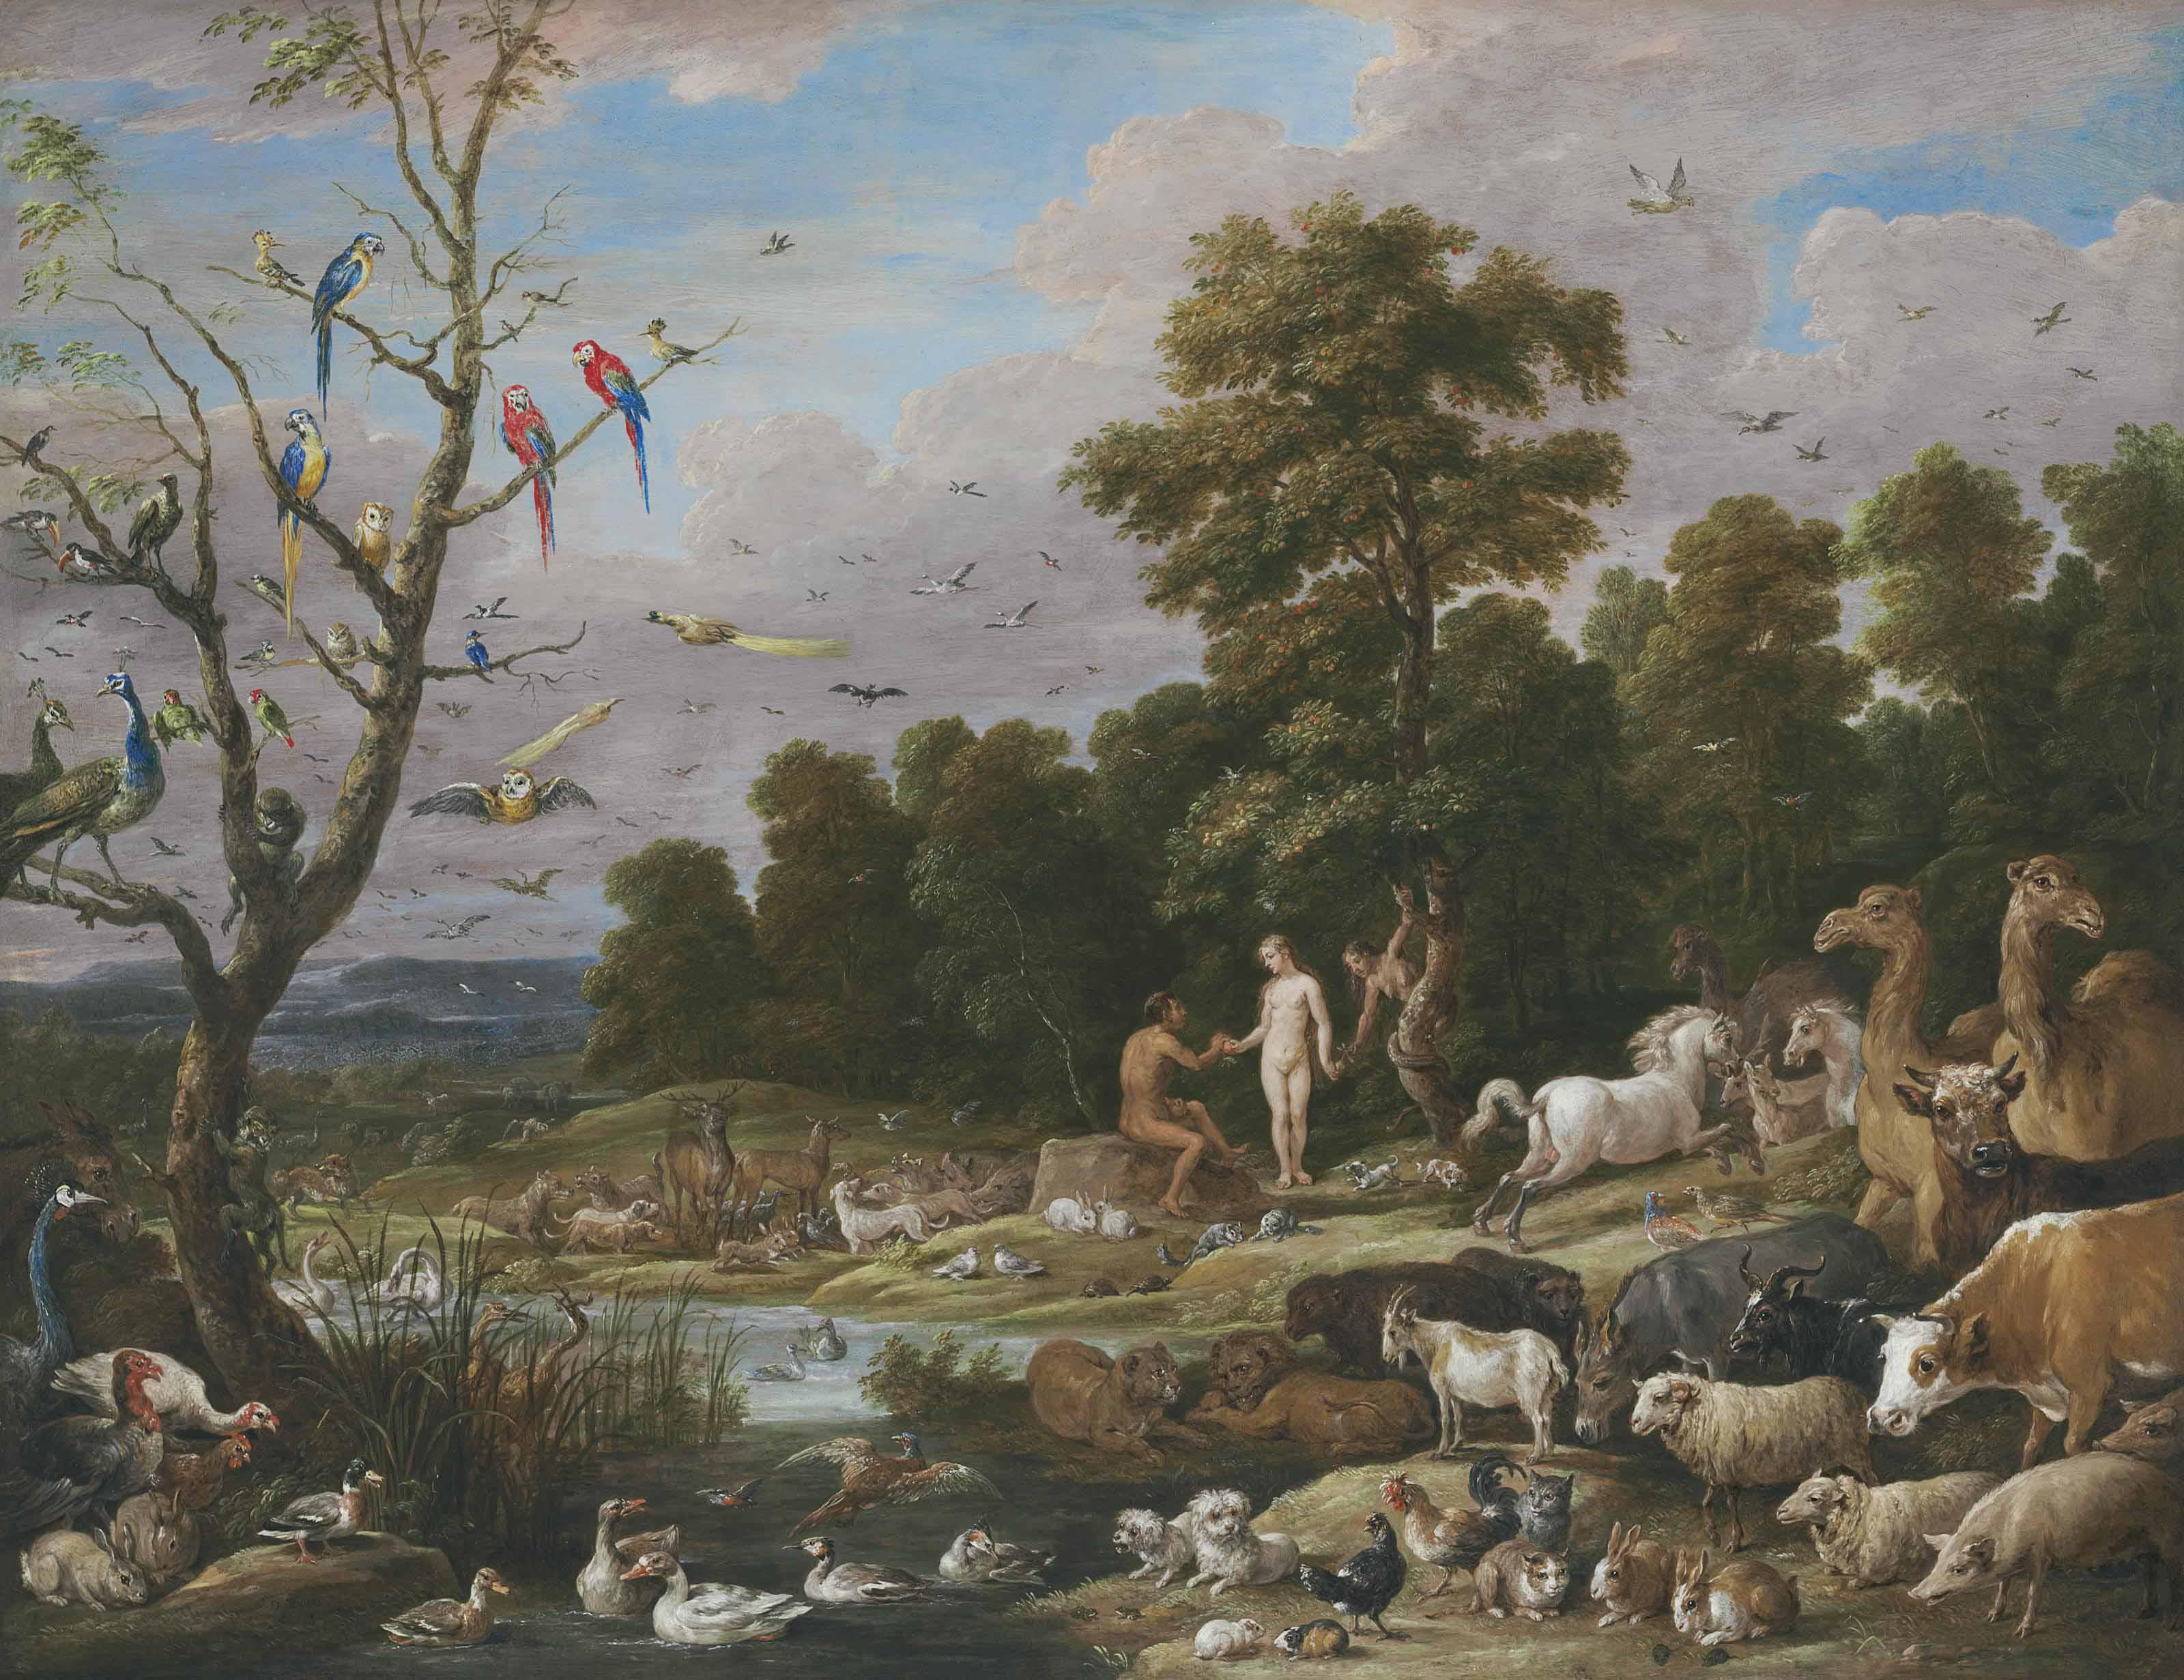 David Teniers II (Antwerp 1610-1690 Brussels) | Adam and Eve in the ...